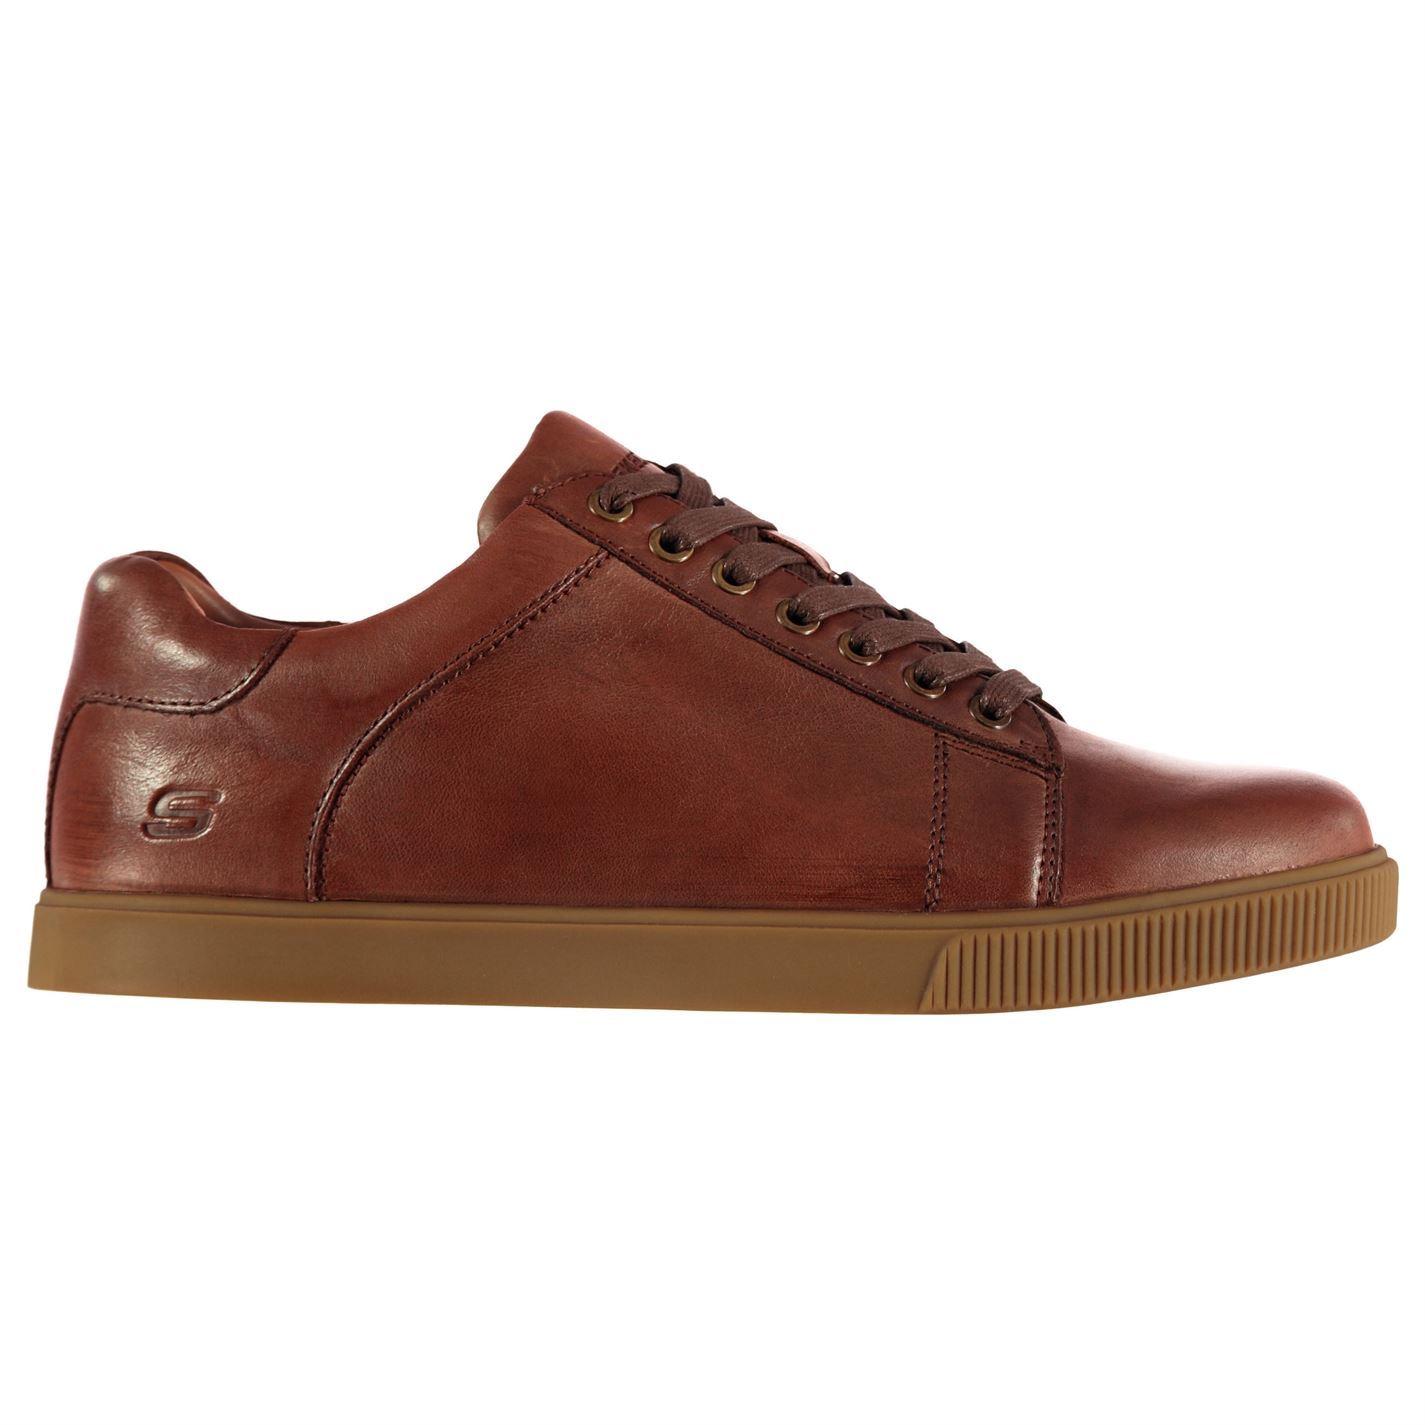 Skechers-Vol-Fandom-Homme-Chaussures-Baskets-decontractees-chaussures-baskets miniature 10